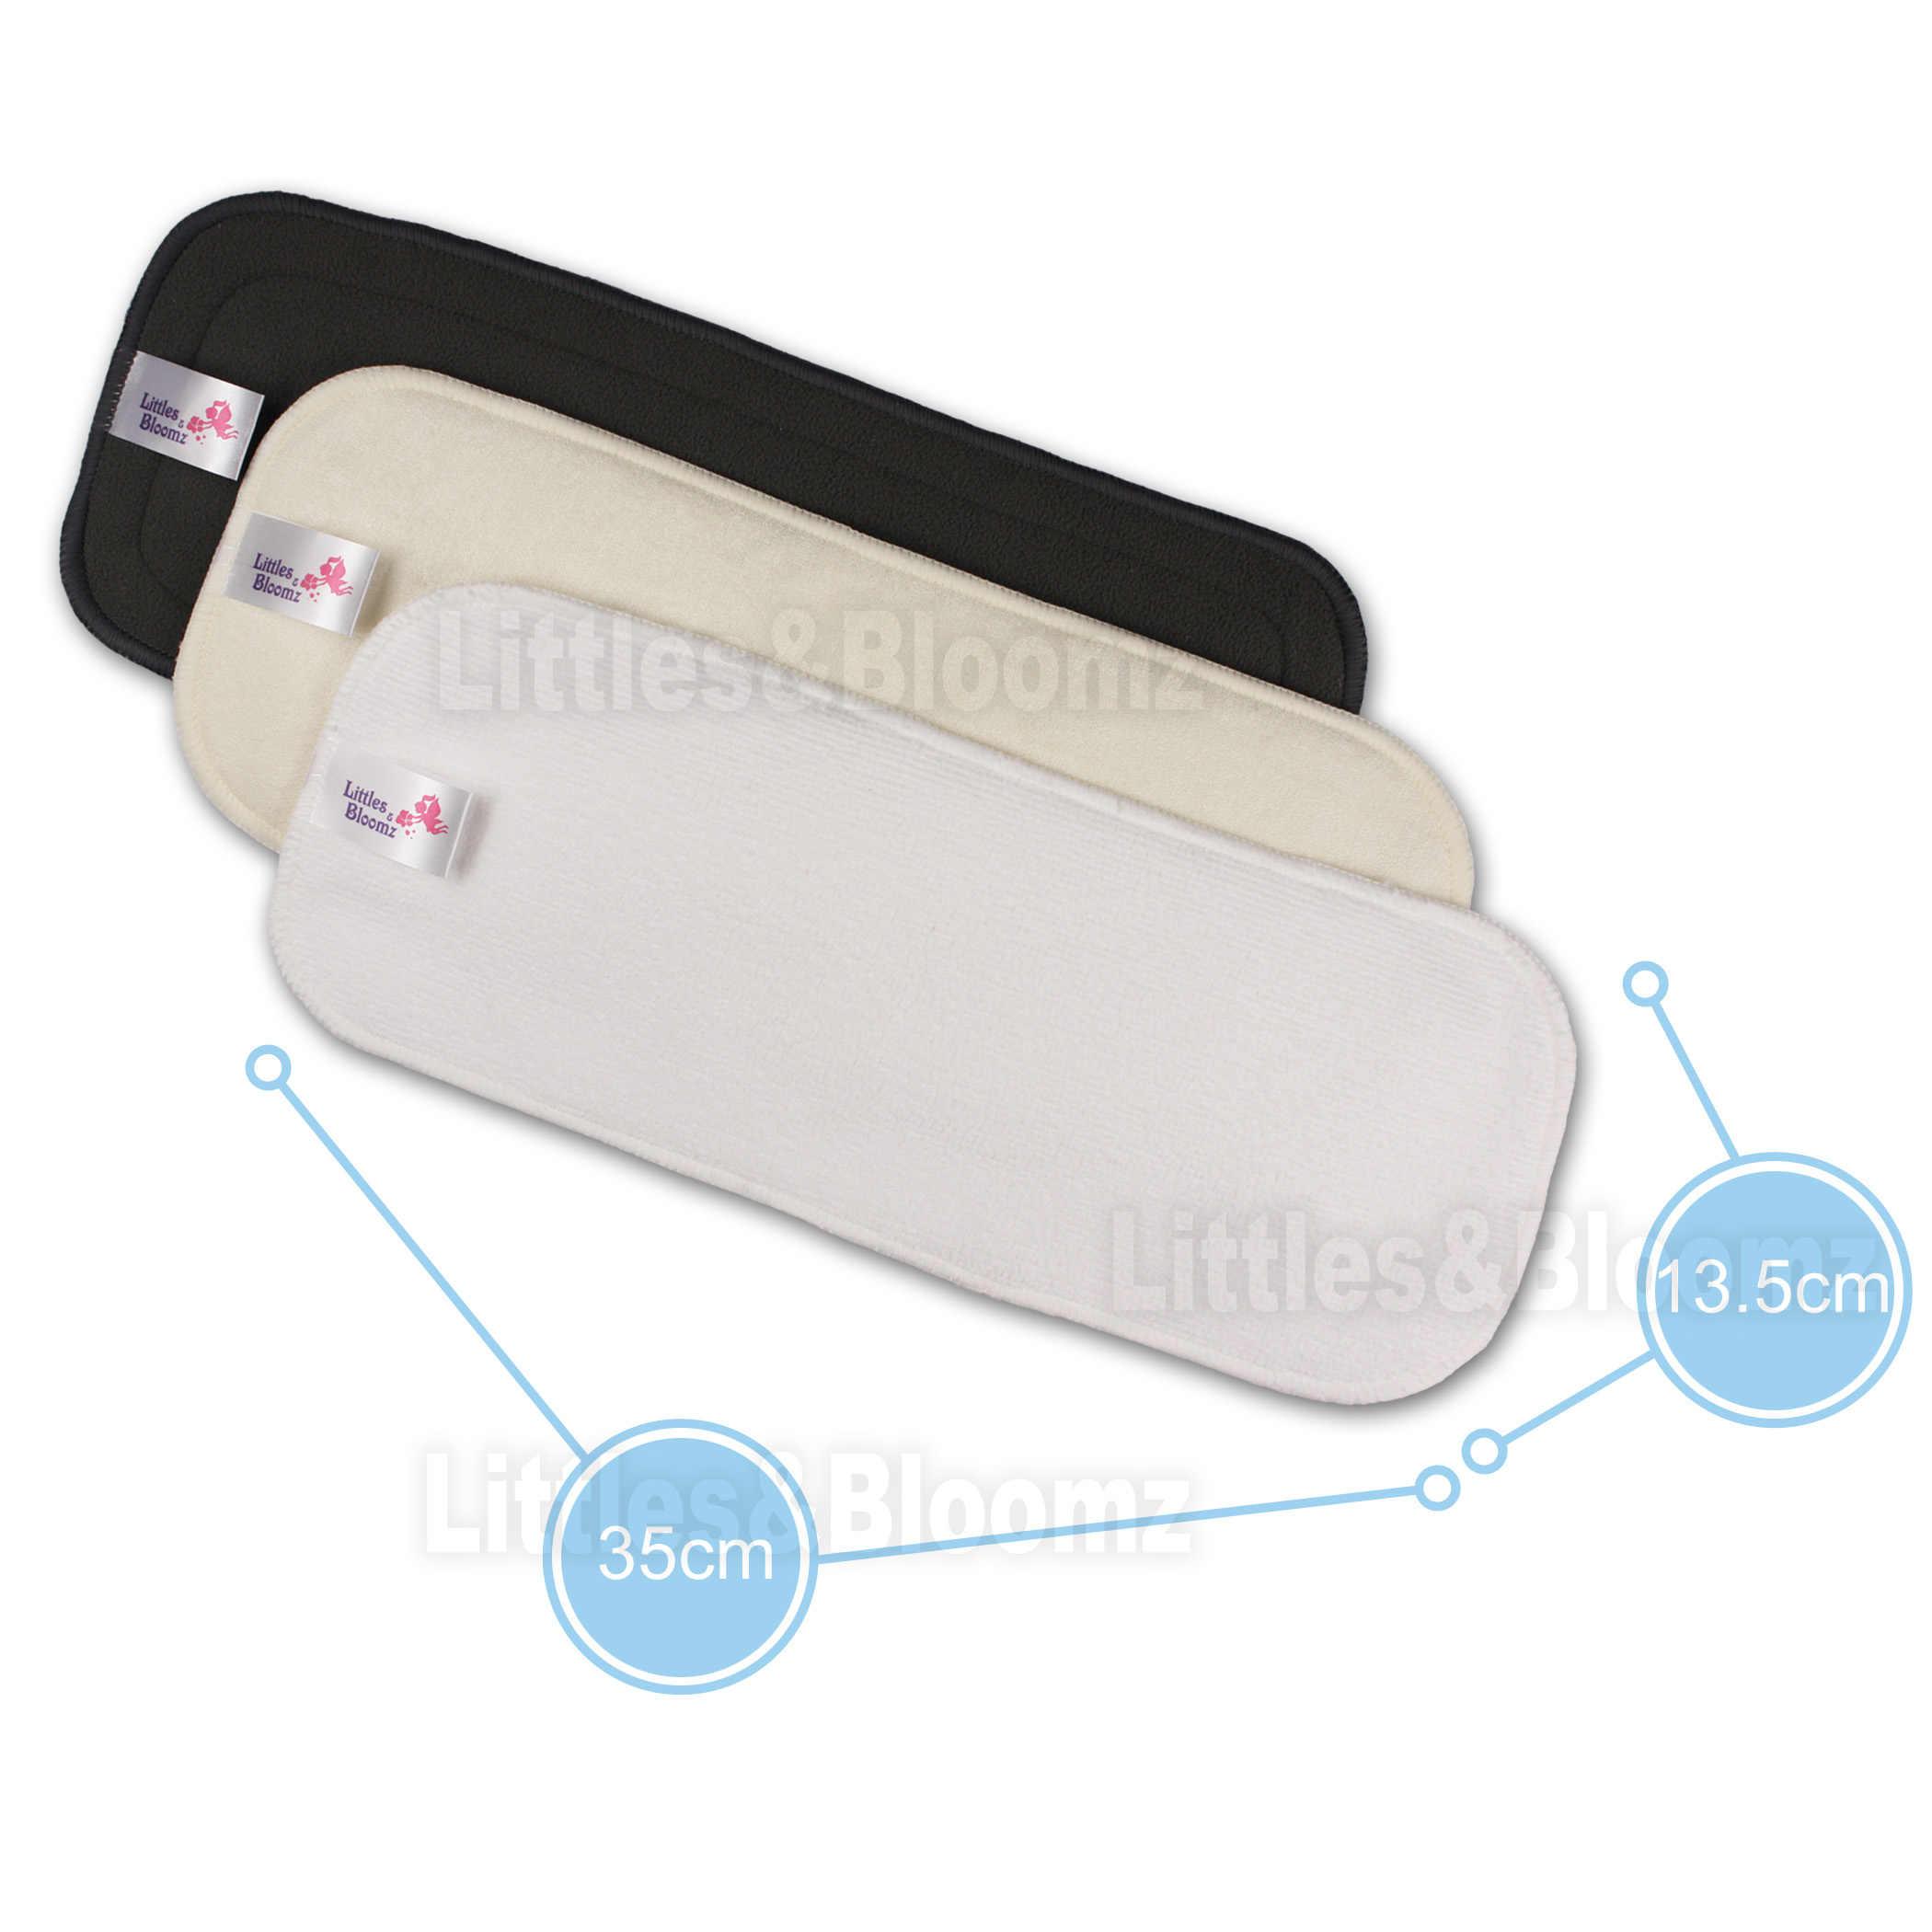 [Littles & Bloomz], 10 Uds., insertos lavables reutilizables, forros de refuerzo para bolsillo, pañal de tela, microfibra, inserto de carbón de bambú